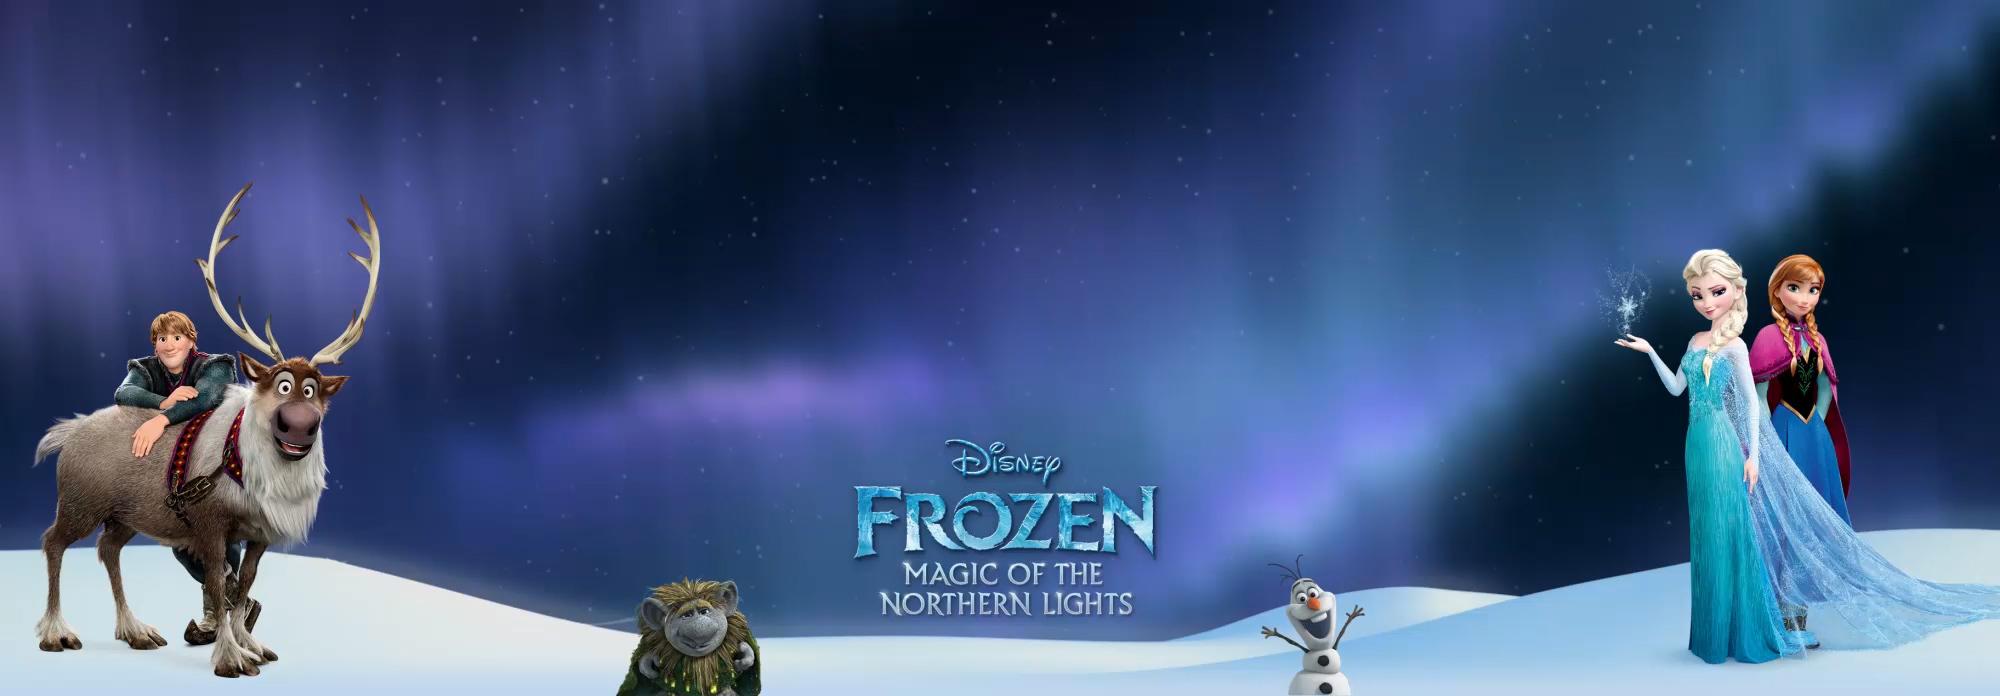 UK Frozen Northern Lights Flex Hero Header